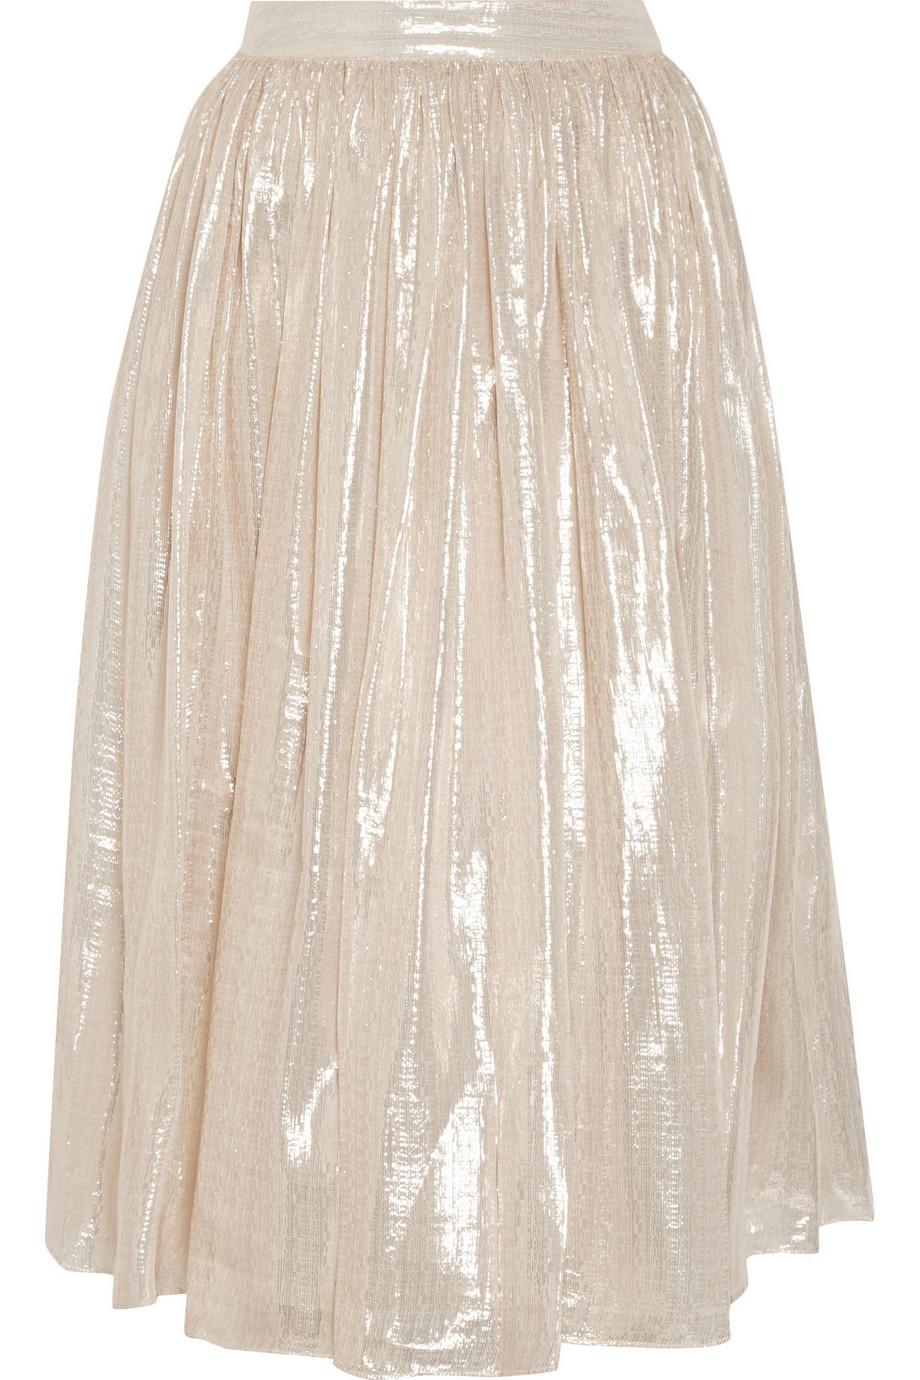 Alice + Olivia Evita Pleated Metallic Silk-Blend Skirt, Silver, Women's, Size: 2